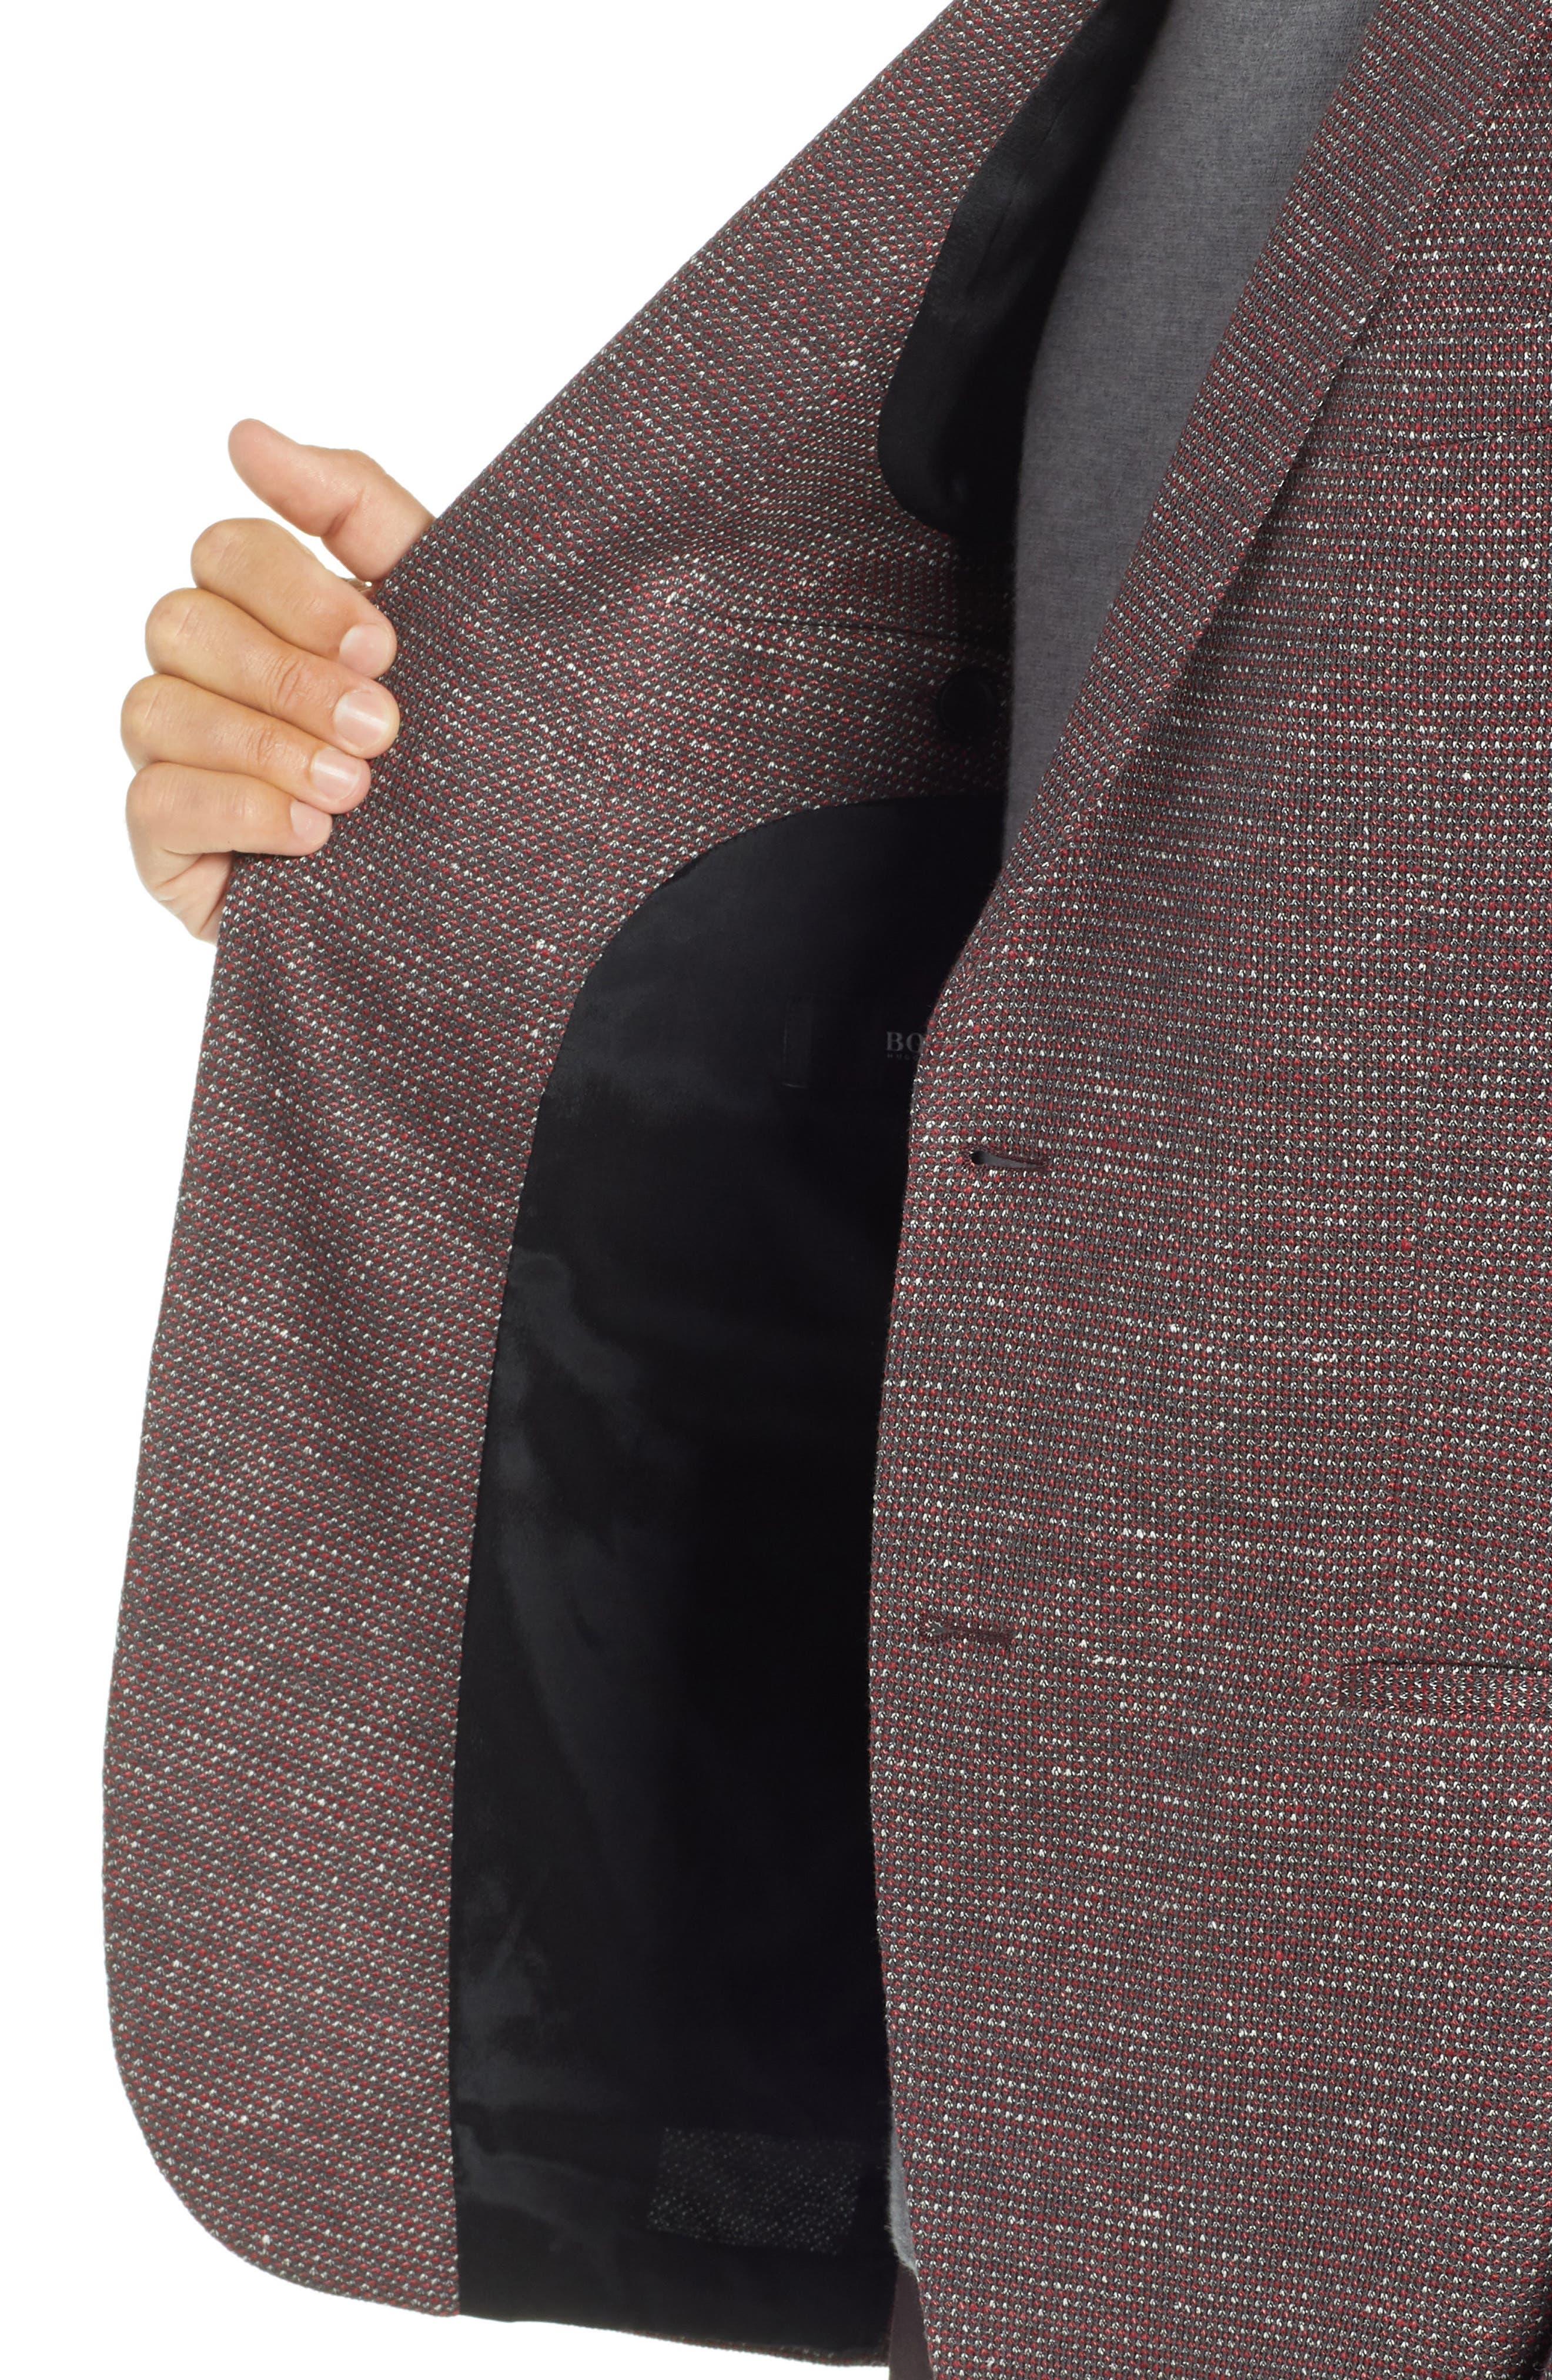 Norwin Trim Fit Cotton Blend Sport Coat,                             Alternate thumbnail 4, color,                             DARK RED